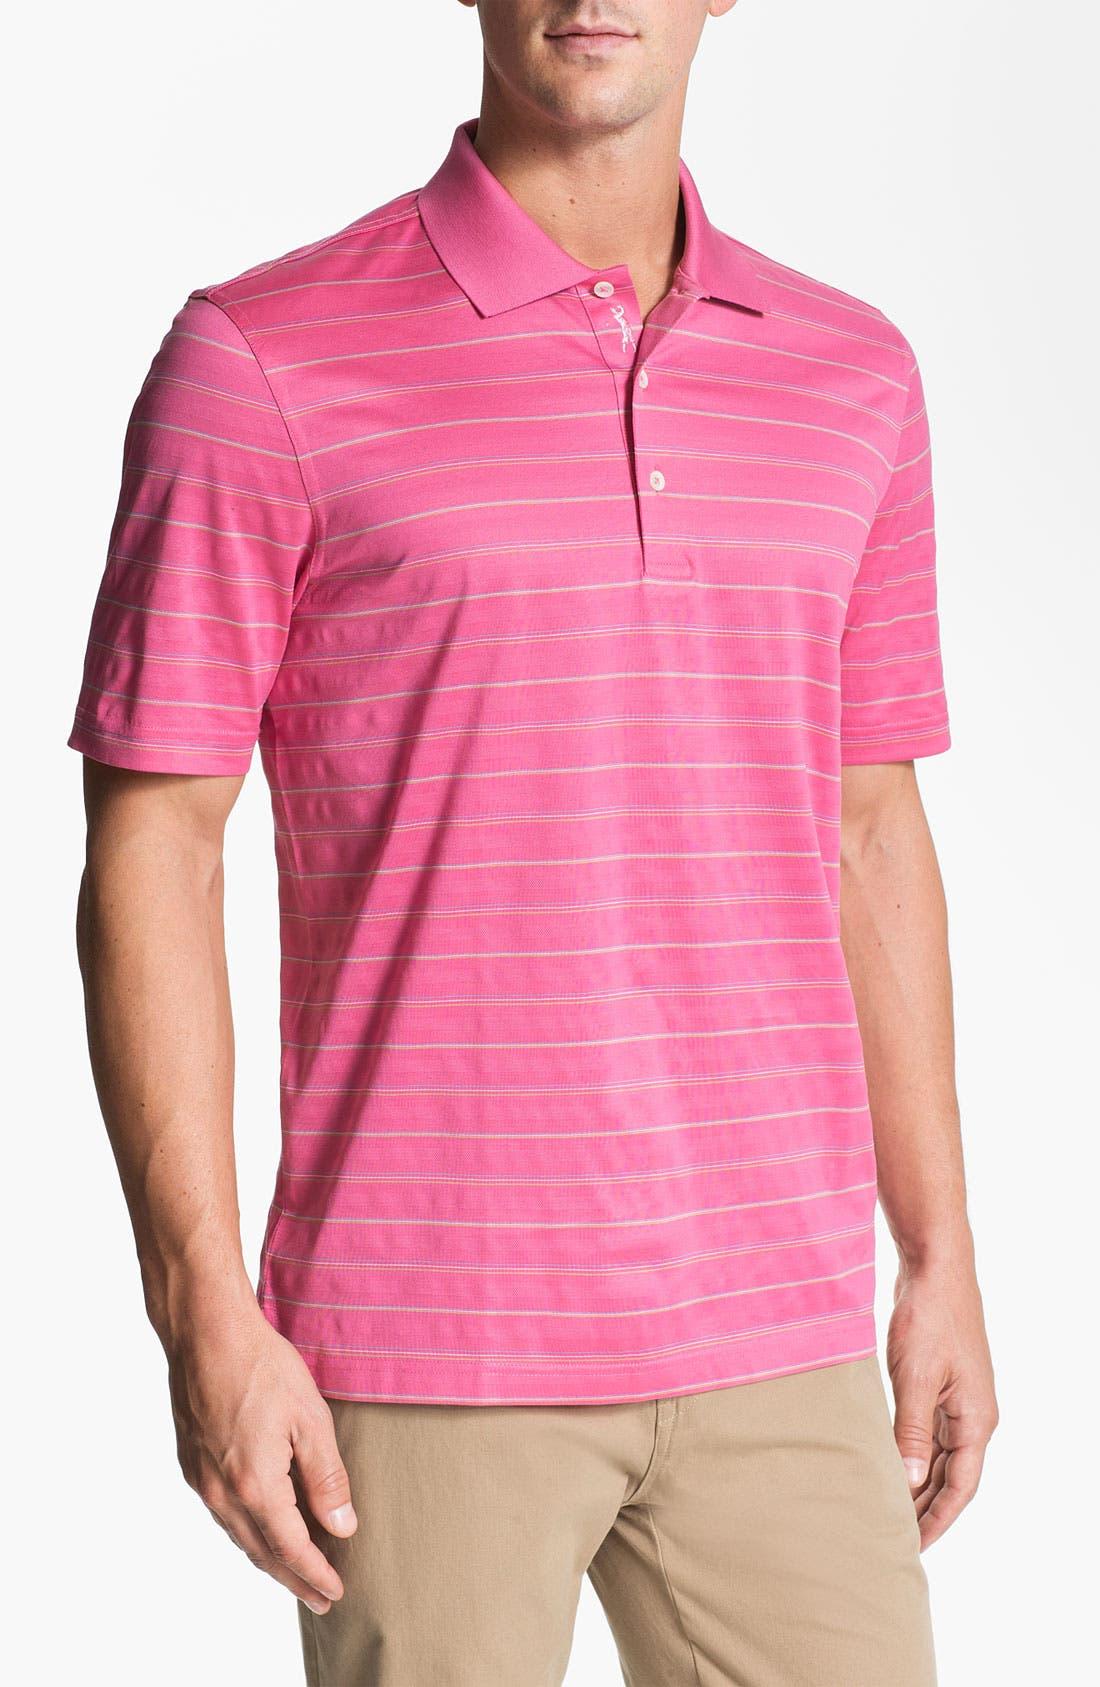 Alternate Image 1 Selected - Bobby Jones 'Textured Stripe' Golf Polo